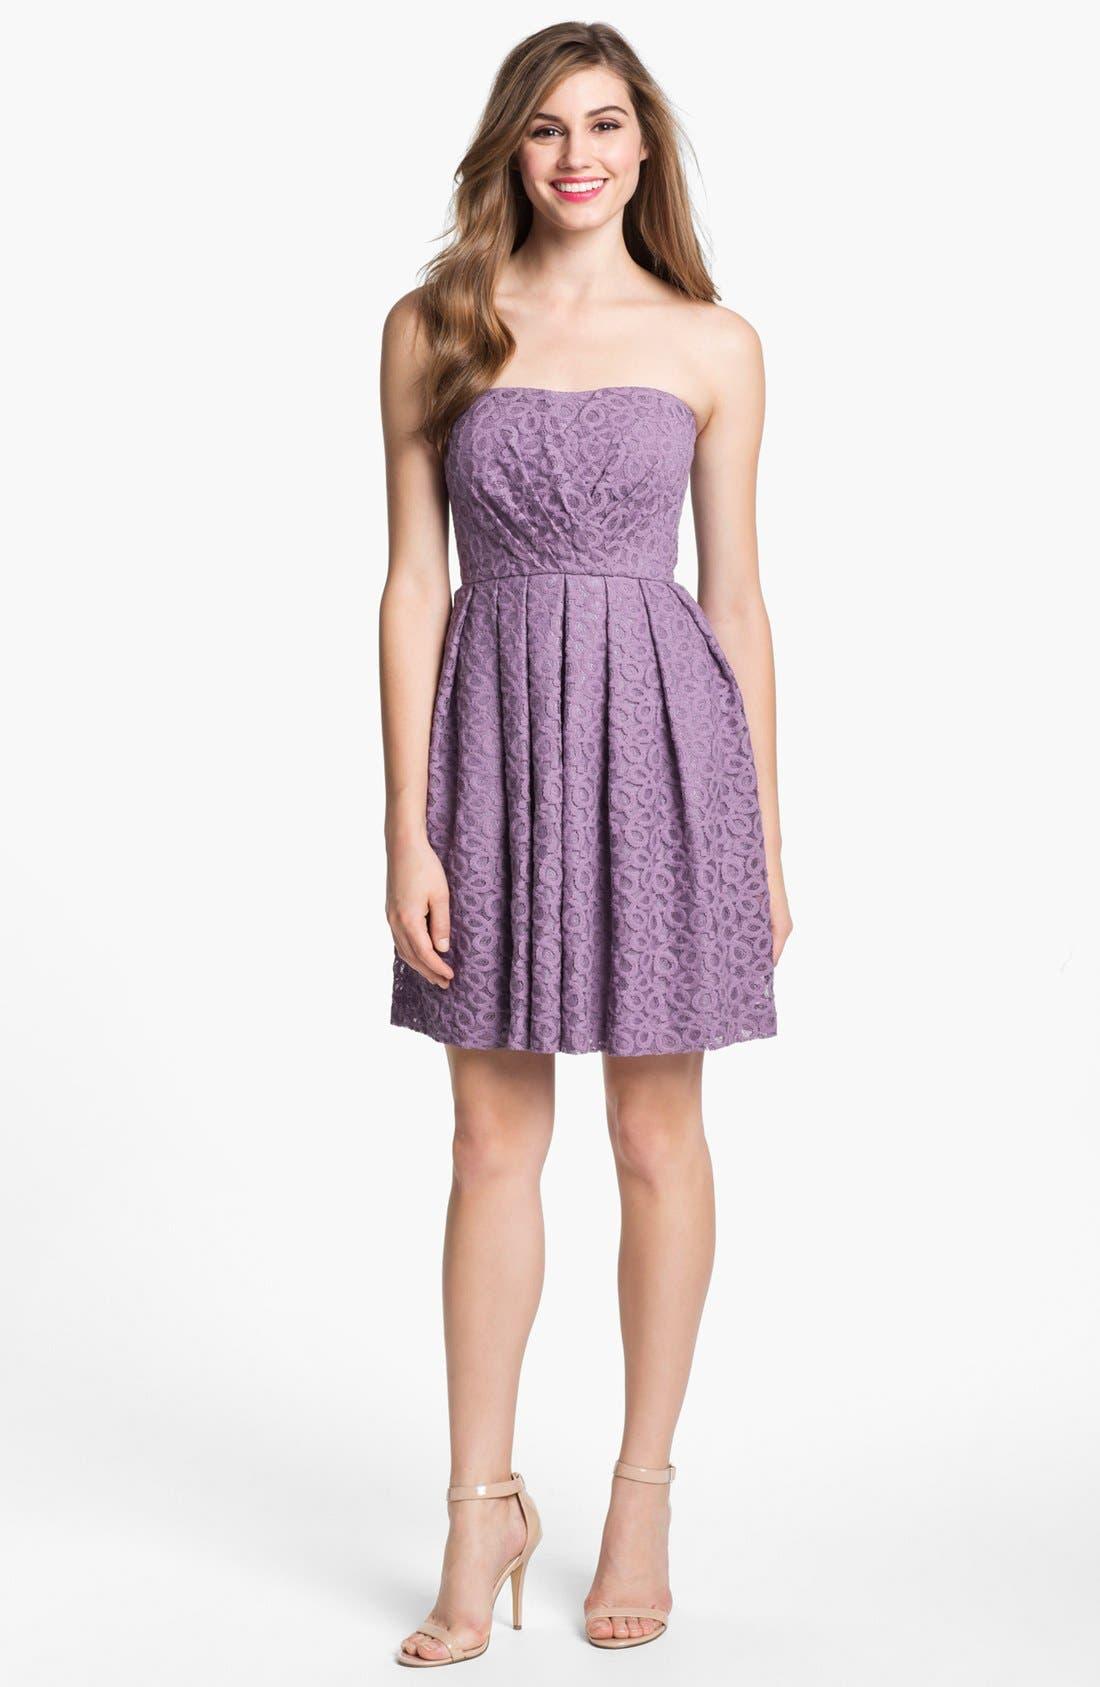 Main Image - Donna Morgan 'Nicole' Strapless Lace Dress